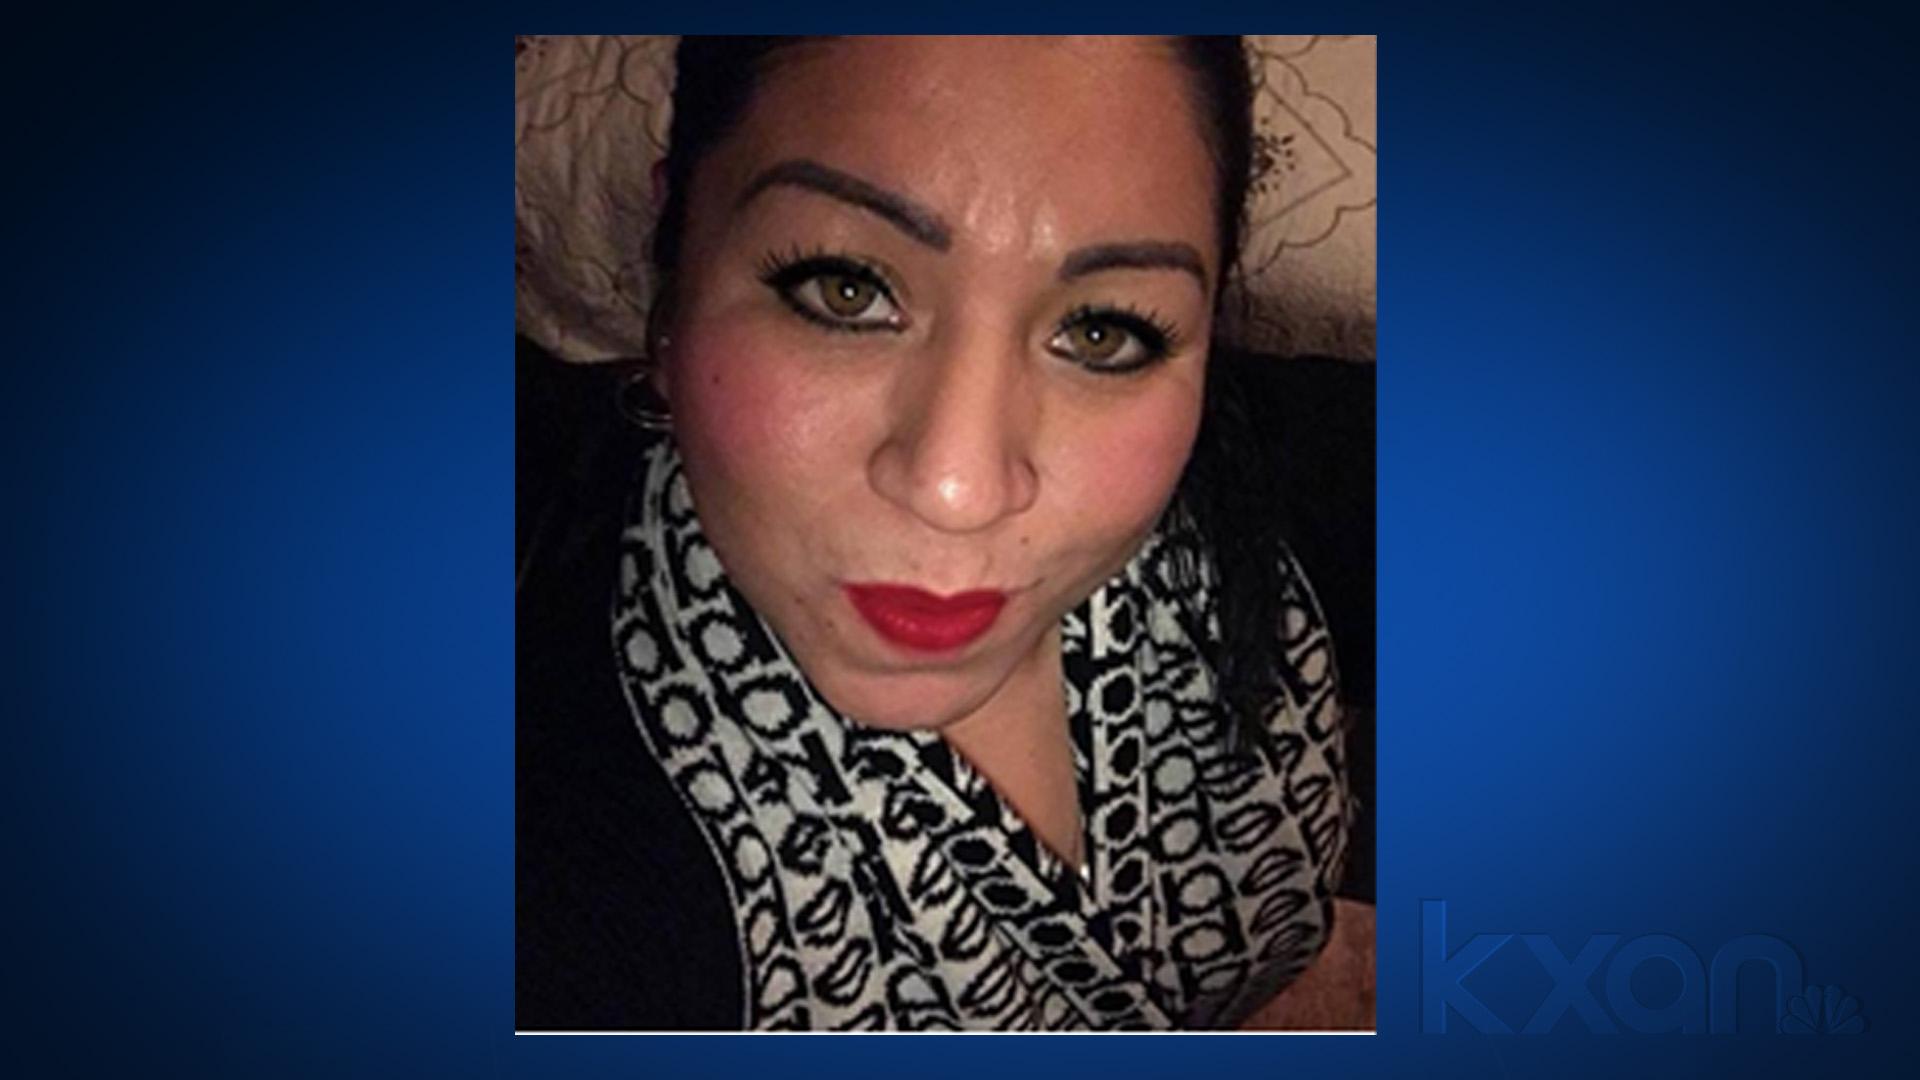 kyle missing woman espinoza_edited-1_1551289722703.jpg.jpg